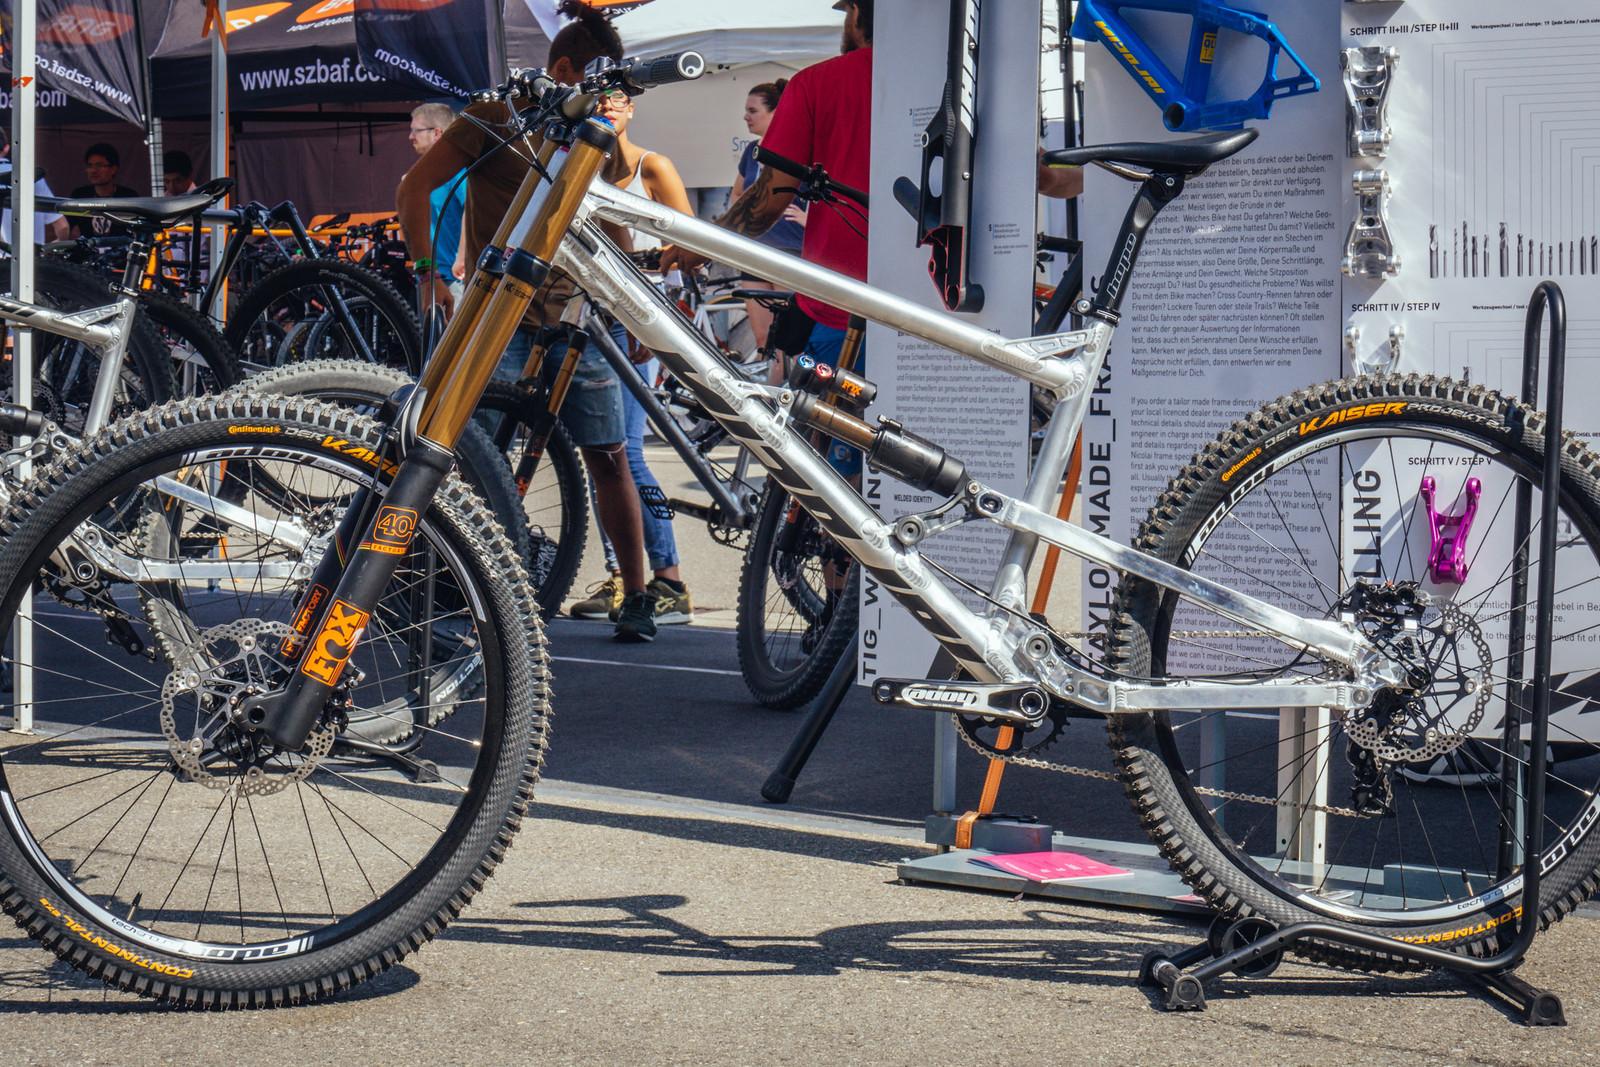 Nicolai ION-G19 QLFLINE - EUROBIKE - 2017 Downhill Bikes and Gear - Mountain Biking Pictures - Vital MTB